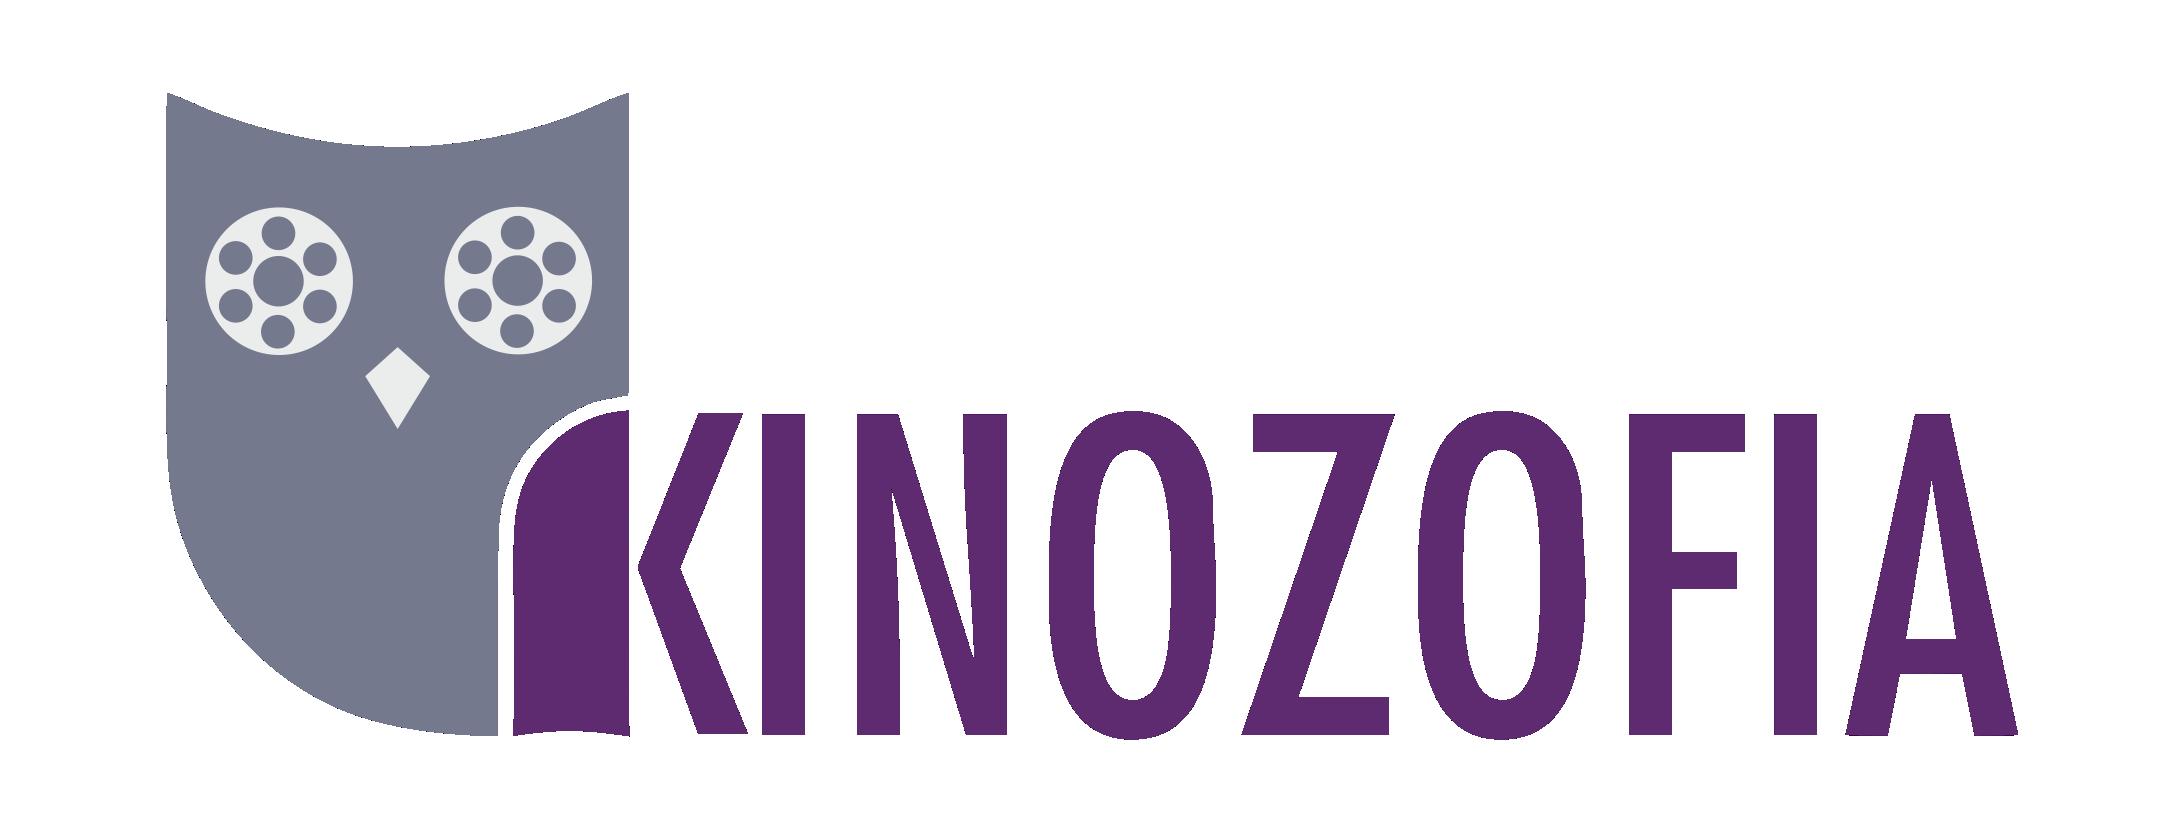 kinozofia logo.png